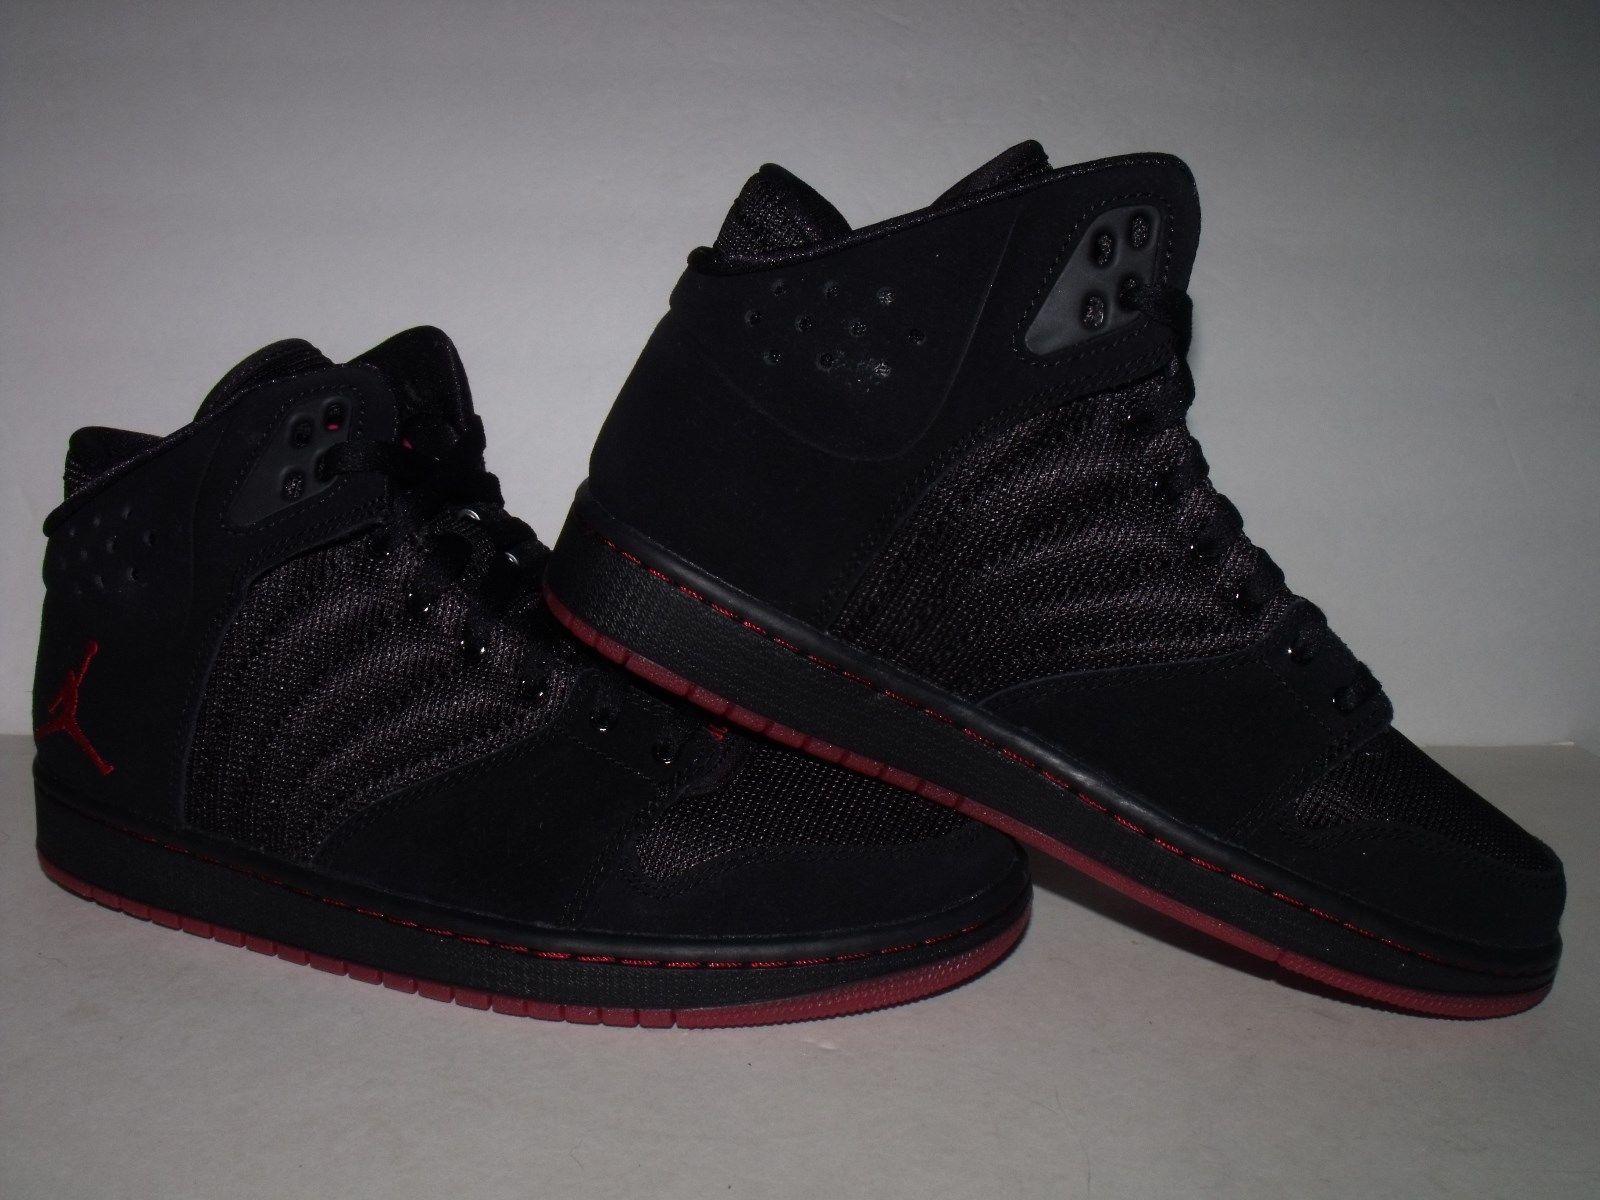 Nike Jordan 1 Flight 4 Mens Casual BASKETBALL Shoe (Black